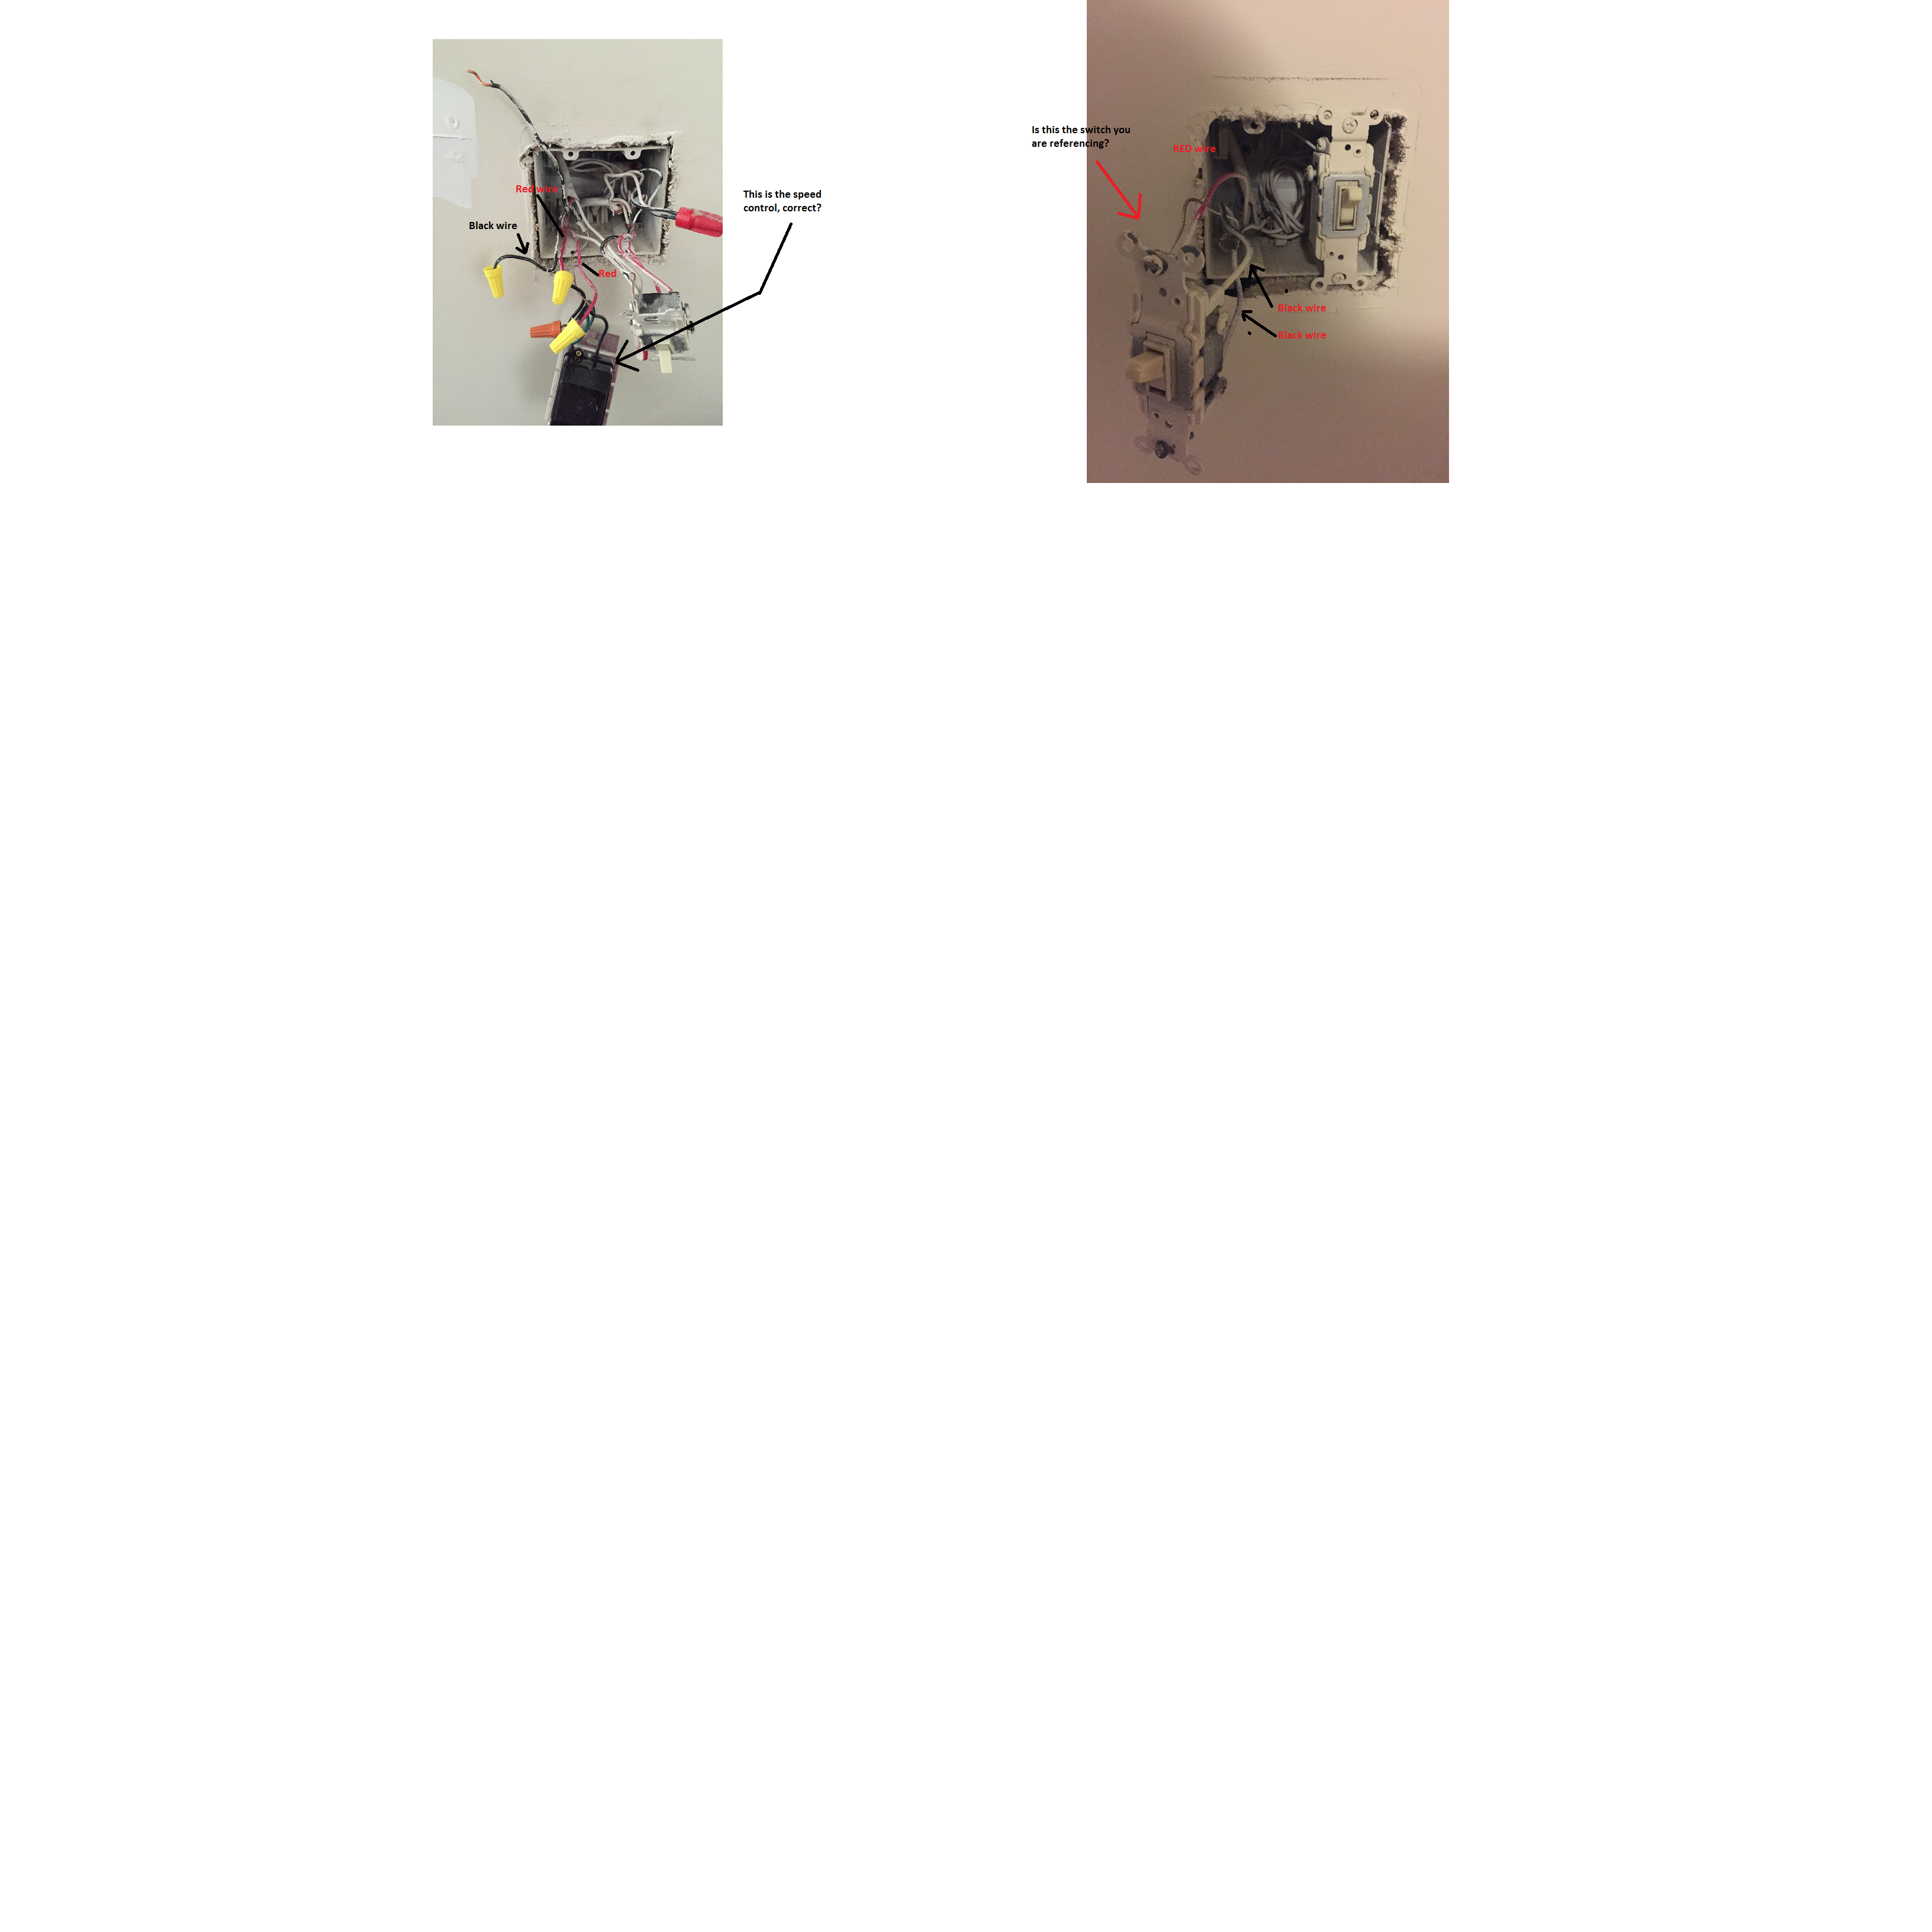 ff0cd9c4-d2cc-4112-a1c4-01ccdb060aab_Dual Slider Changeover.png